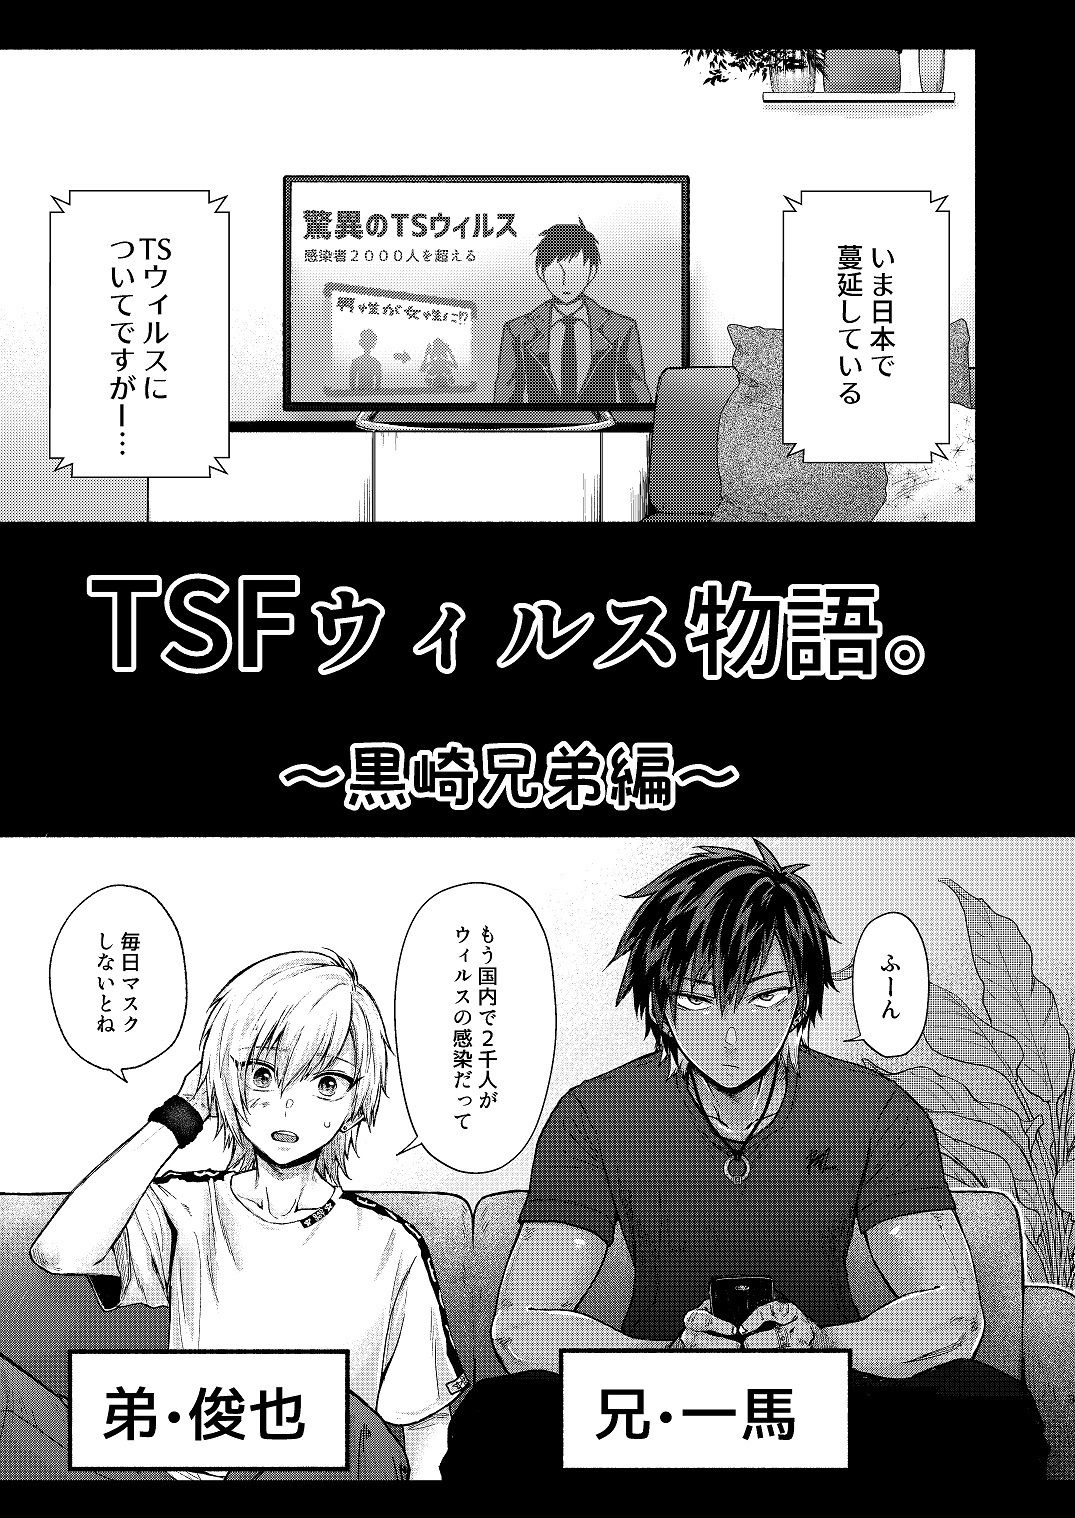 【TSFウィルス物語。~黒崎兄弟編~】サンプル画像1